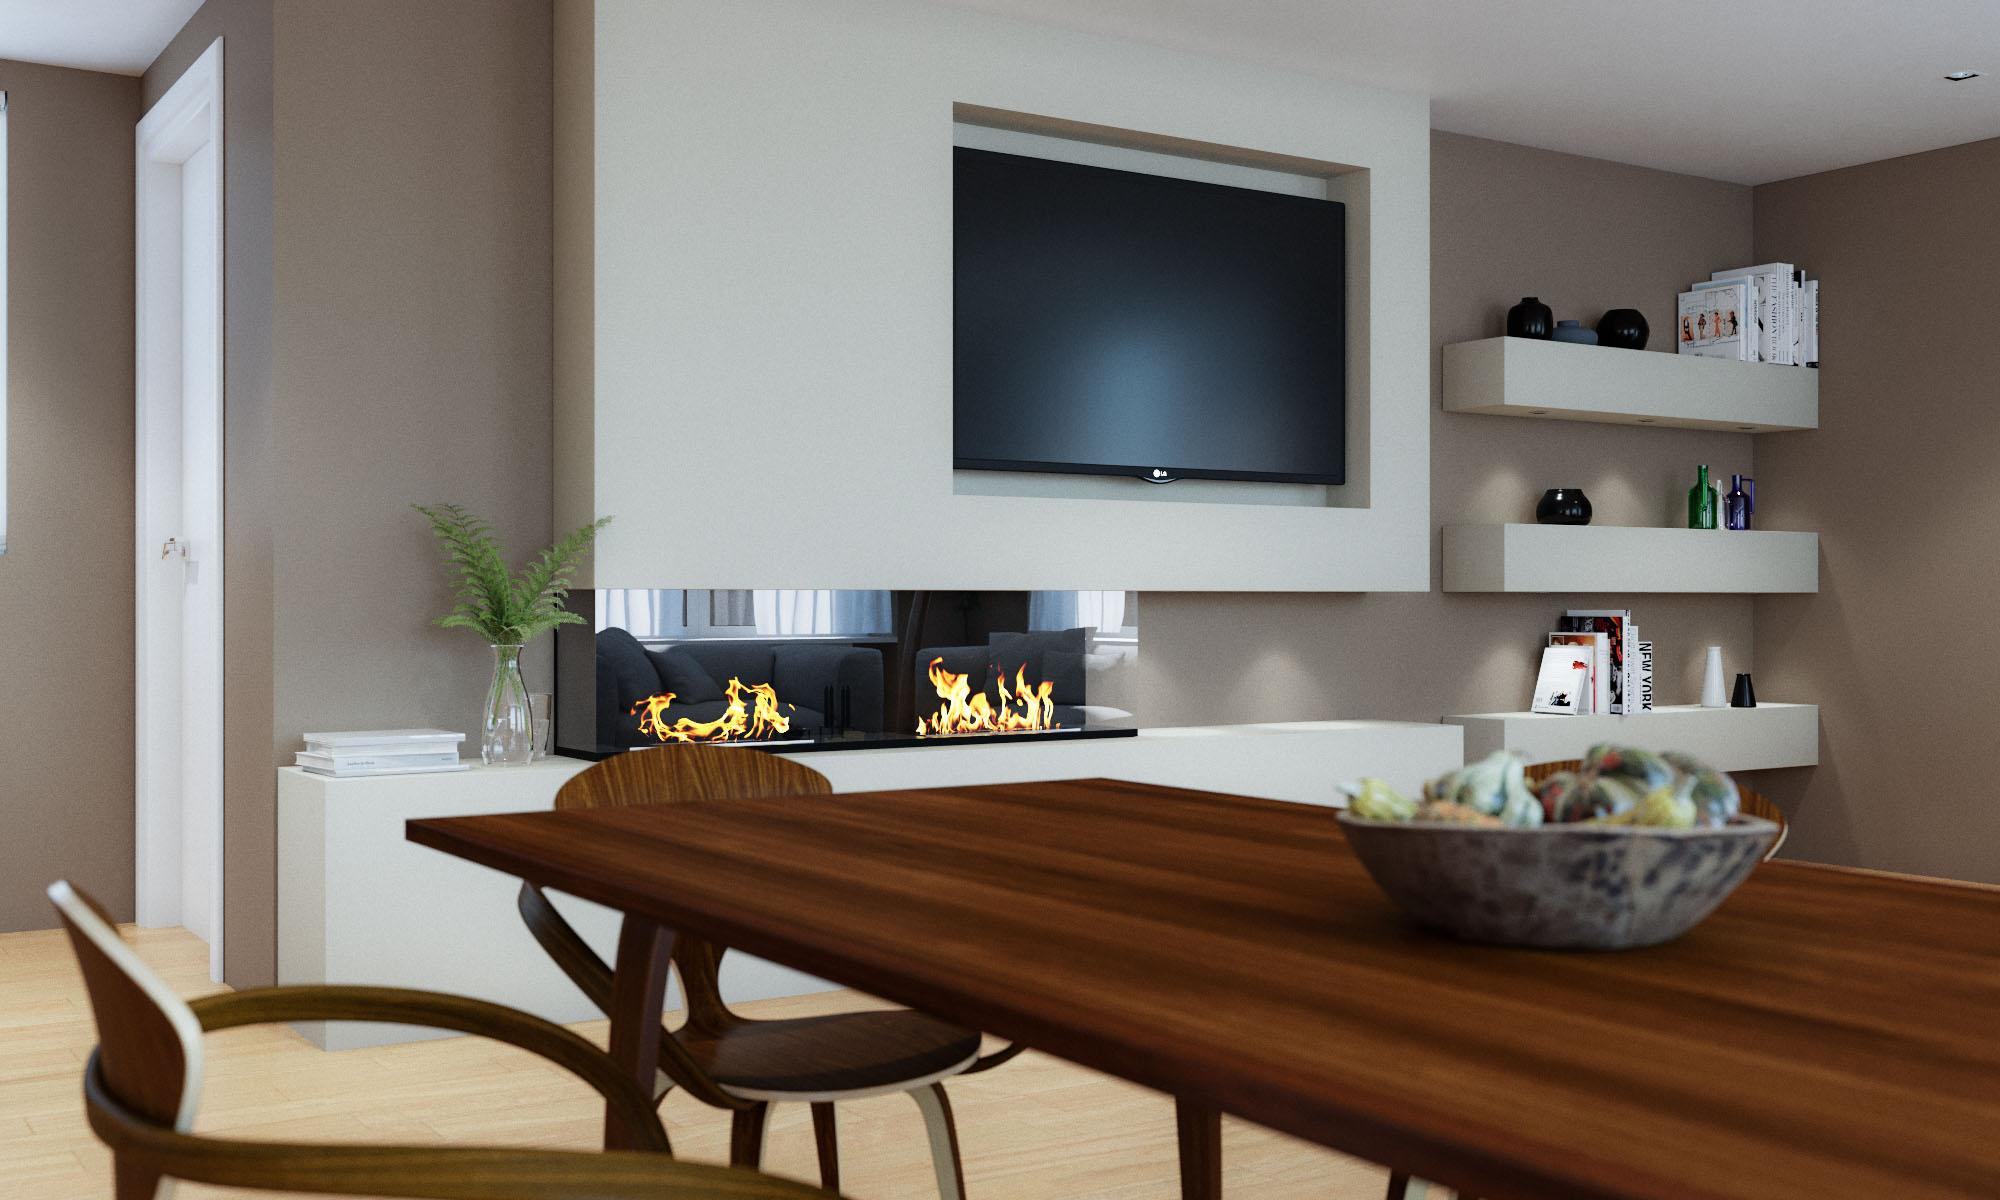 Render 3D arquitectura dúplex Donostia detalle salón comedor 2